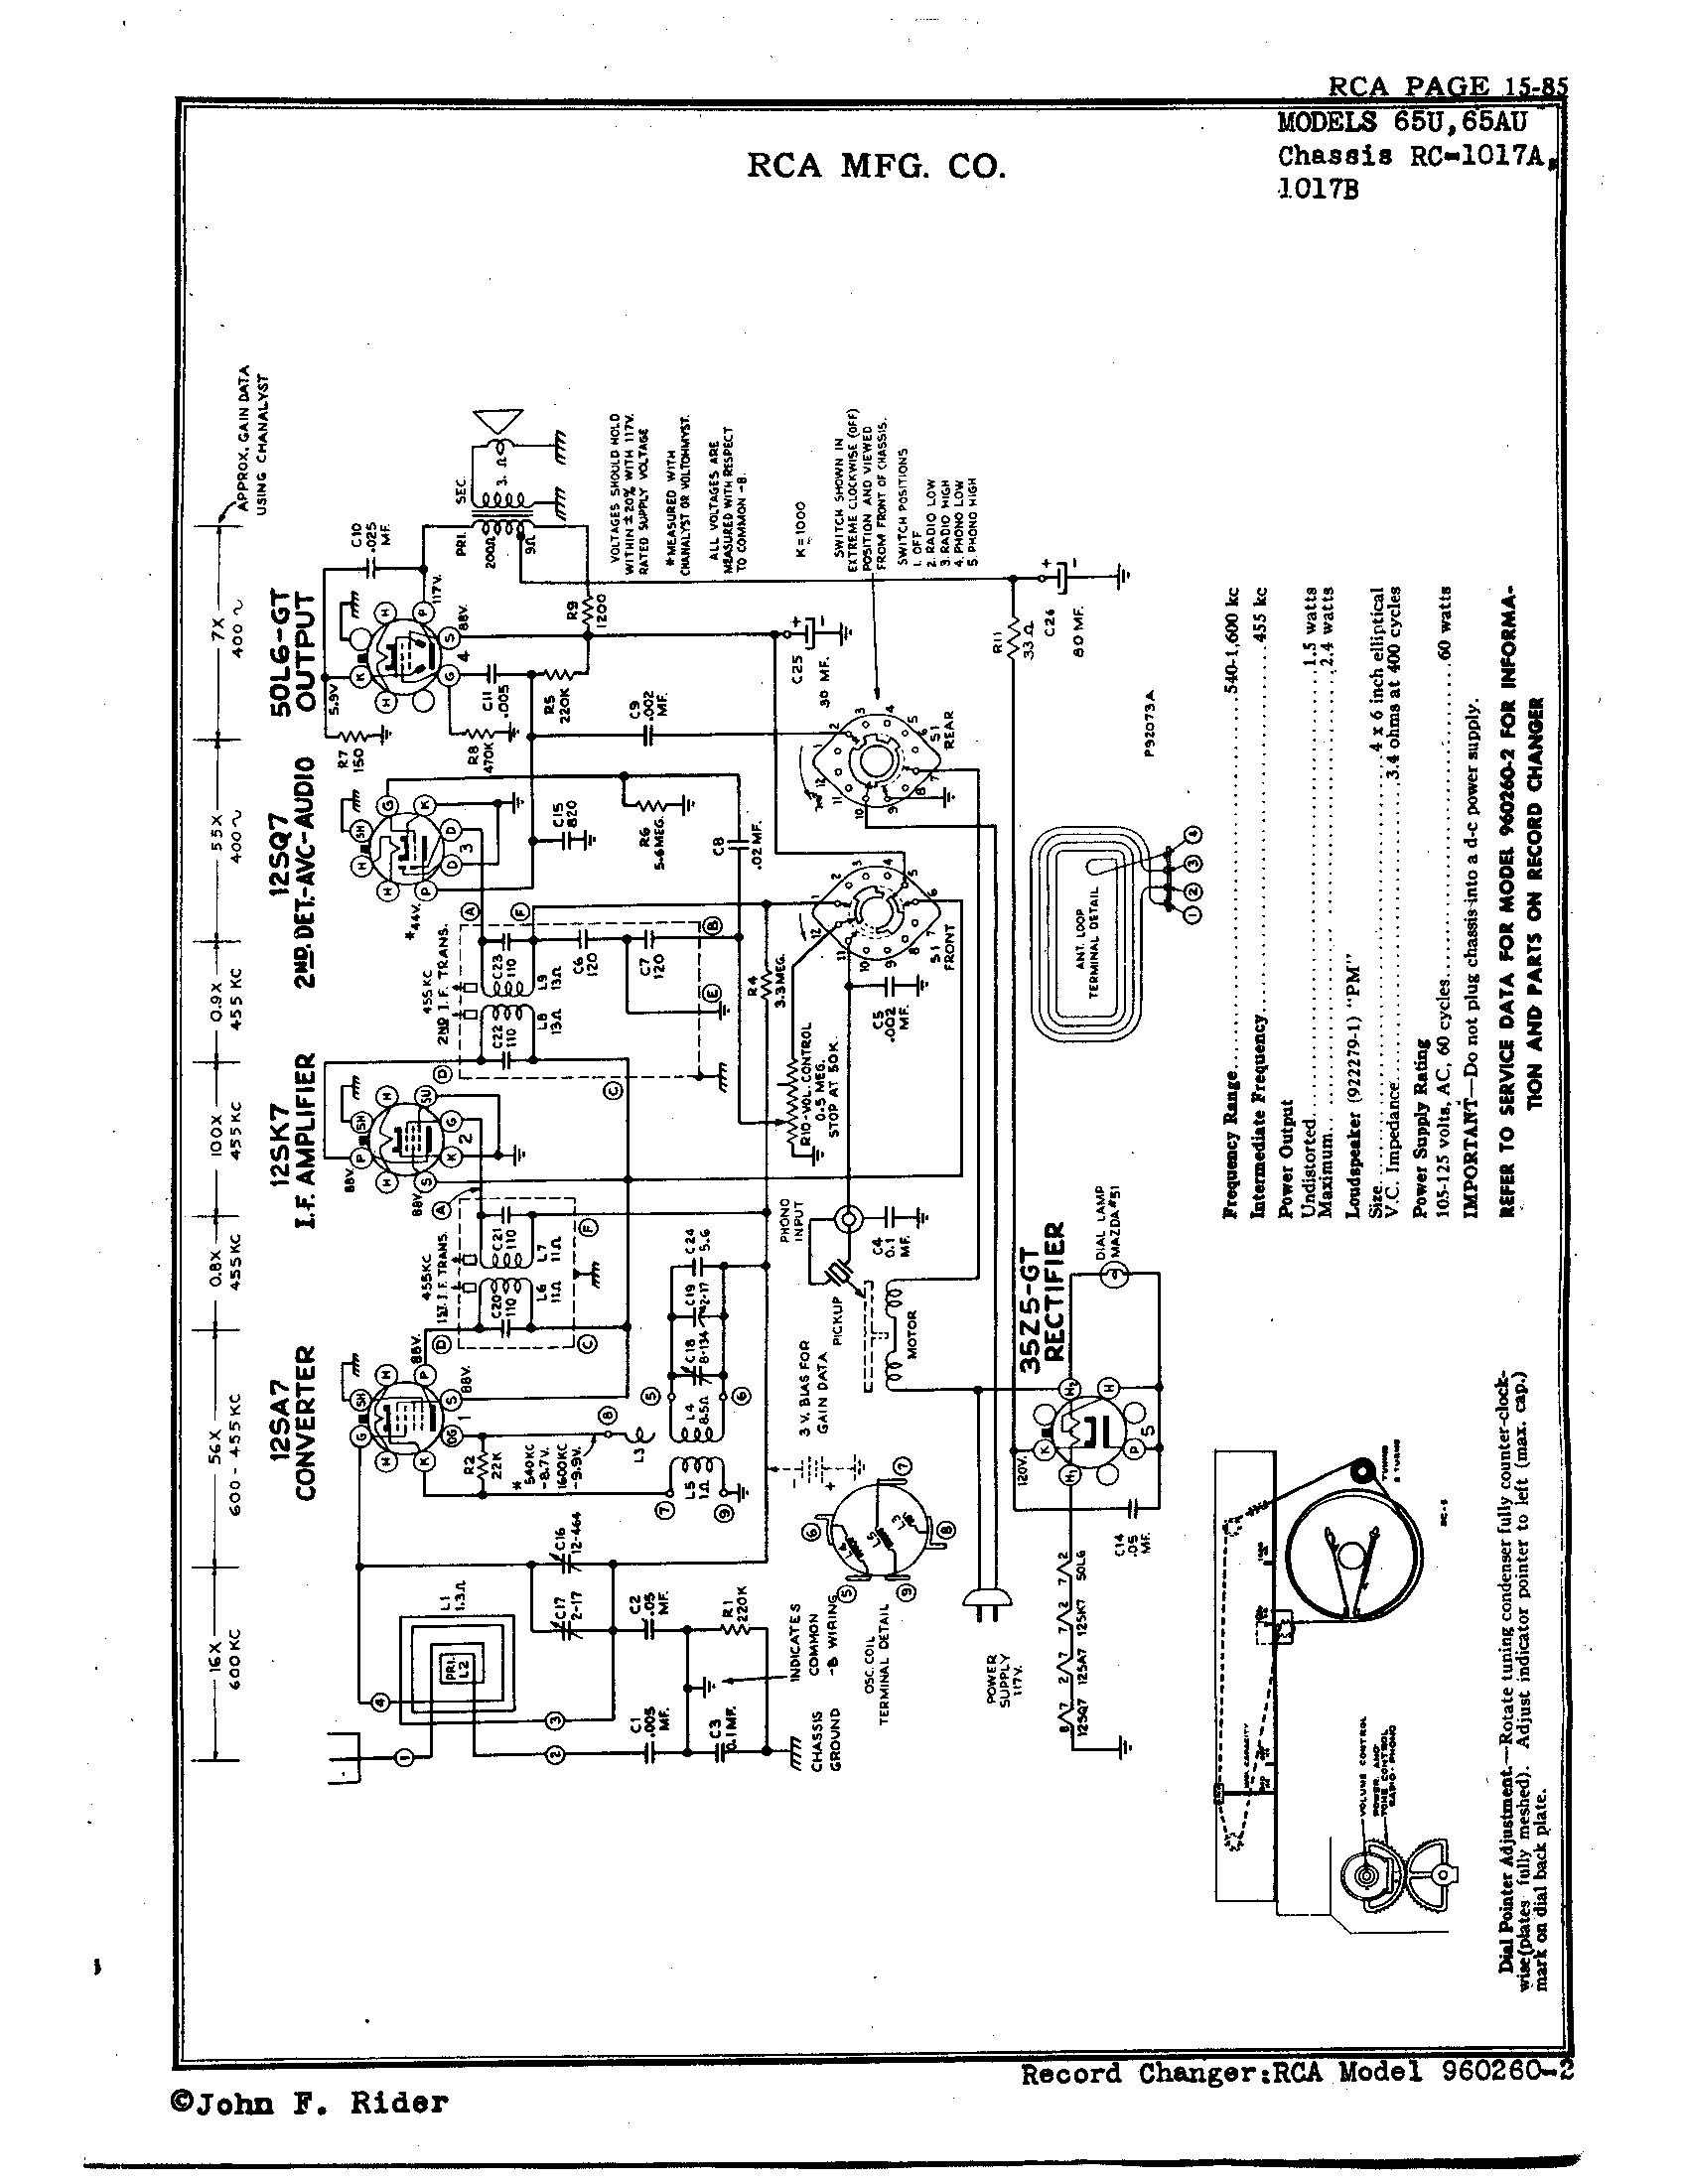 rca_victor_co_inc_65u_pg15-1 Radio Schematics on two tube, 2 vacuum tube, simple fm, old car, simple regenerative, vintage transistor, all american 5 tube,